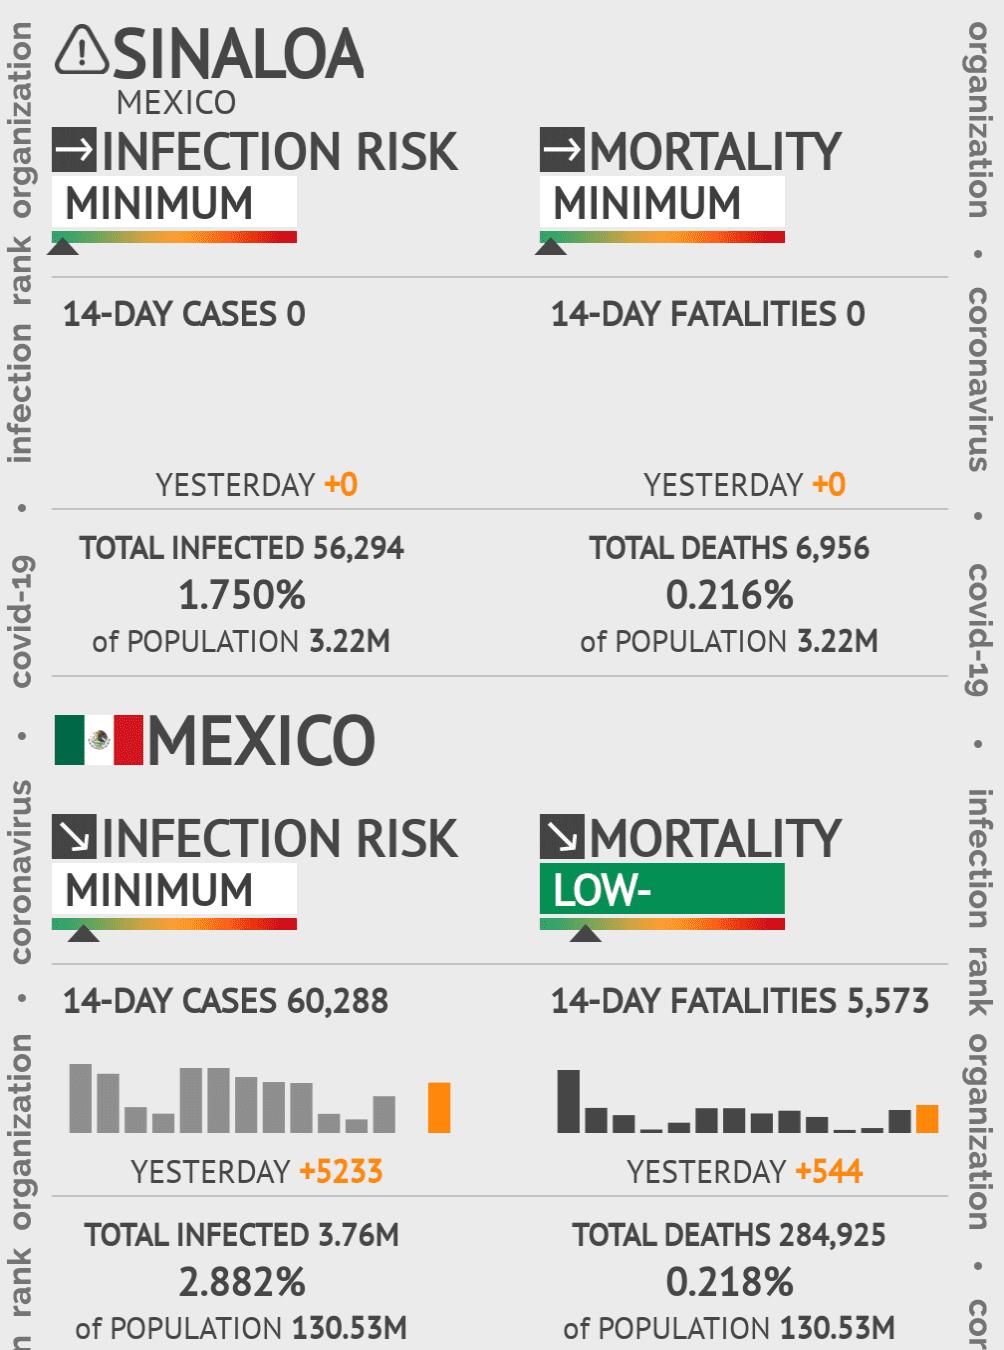 Sinaloa Coronavirus Covid-19 Risk of Infection on February 25, 2021